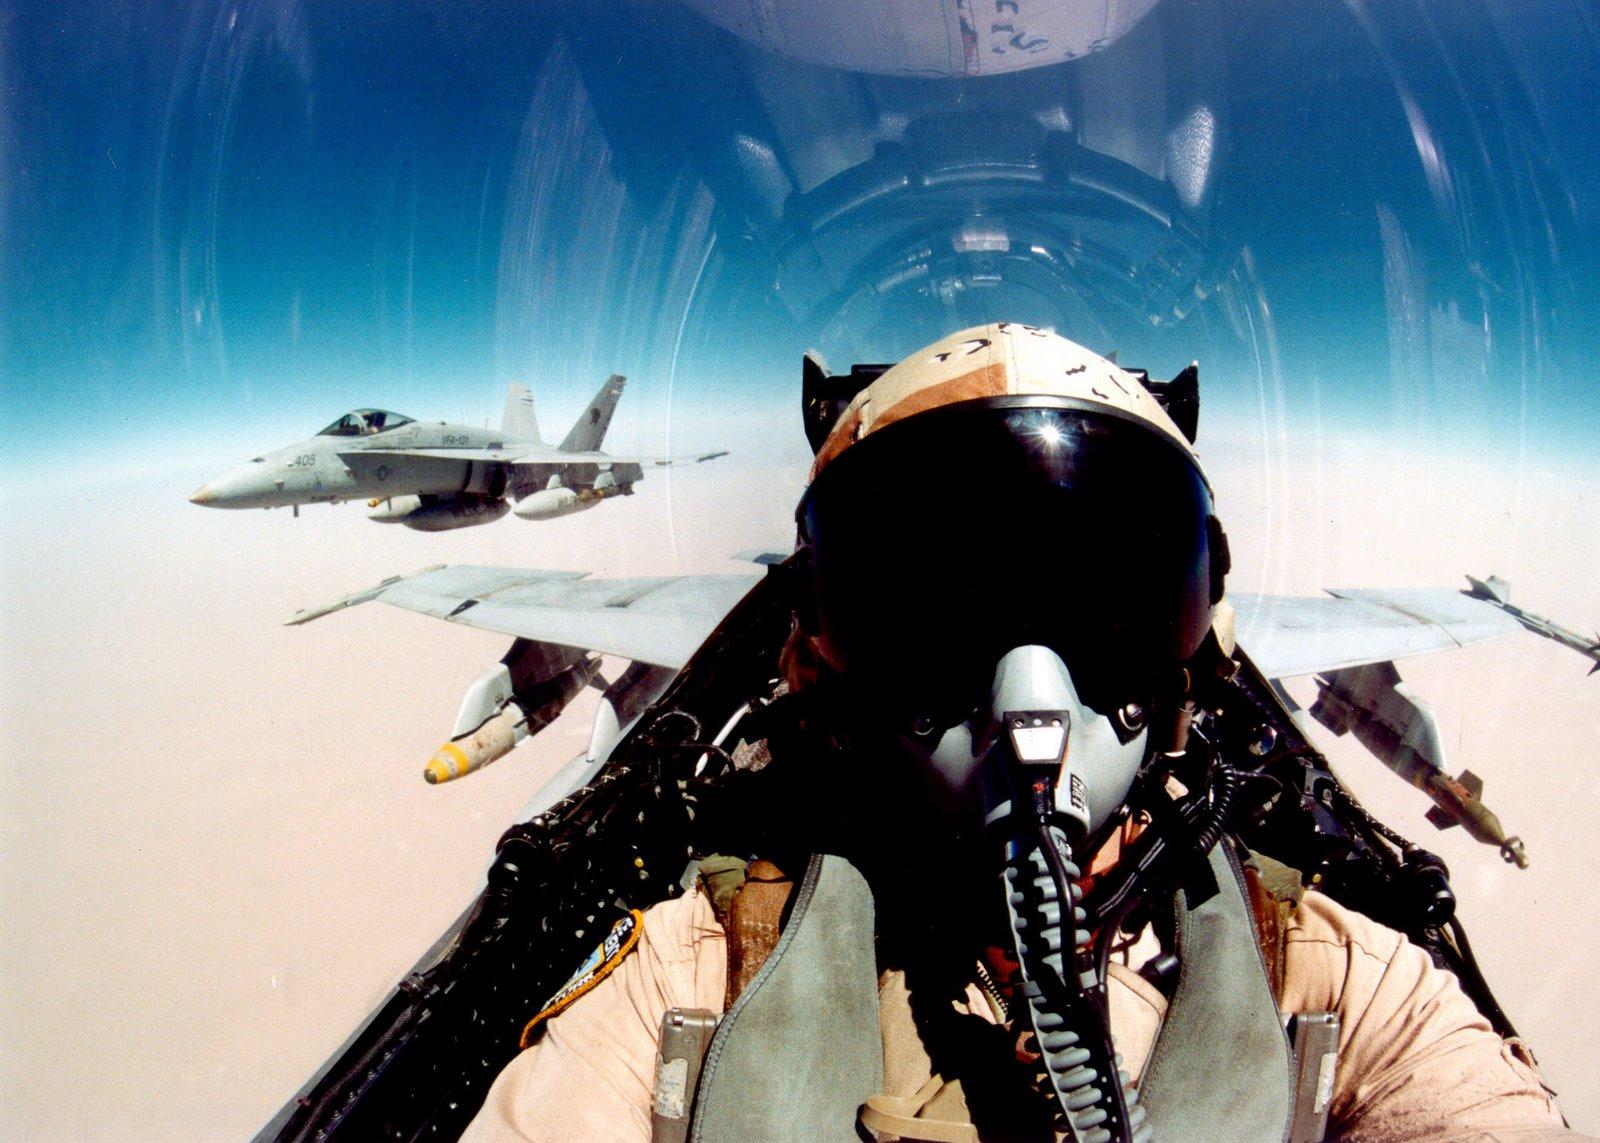 http://1.bp.blogspot.com/_ja676MG45Zg/Sw2wTDDVZBI/AAAAAAAAAjQ/31Hg97GMUzc/s1600/super+hornet+cockpit.jpg